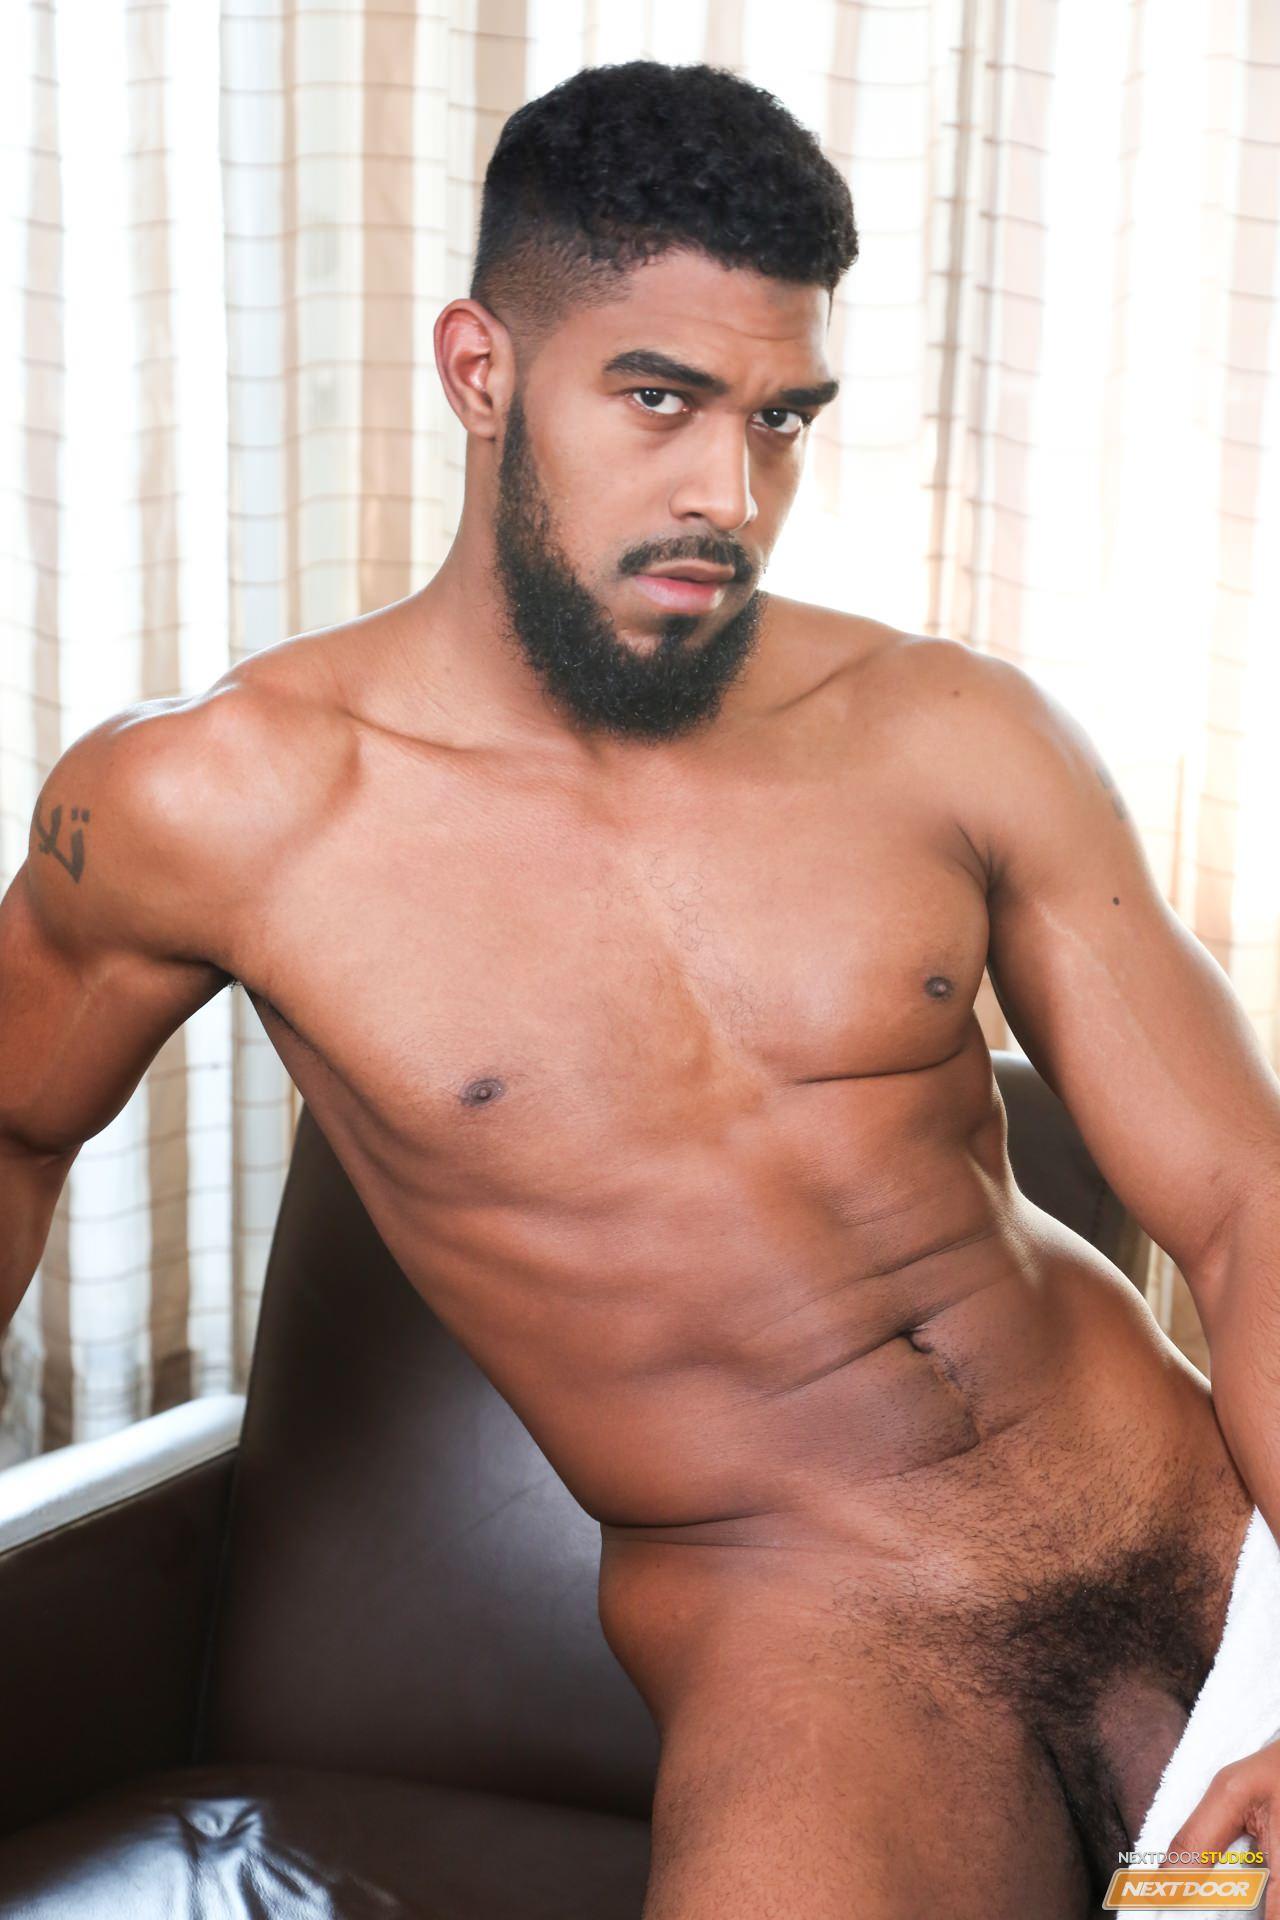 Black male porn star